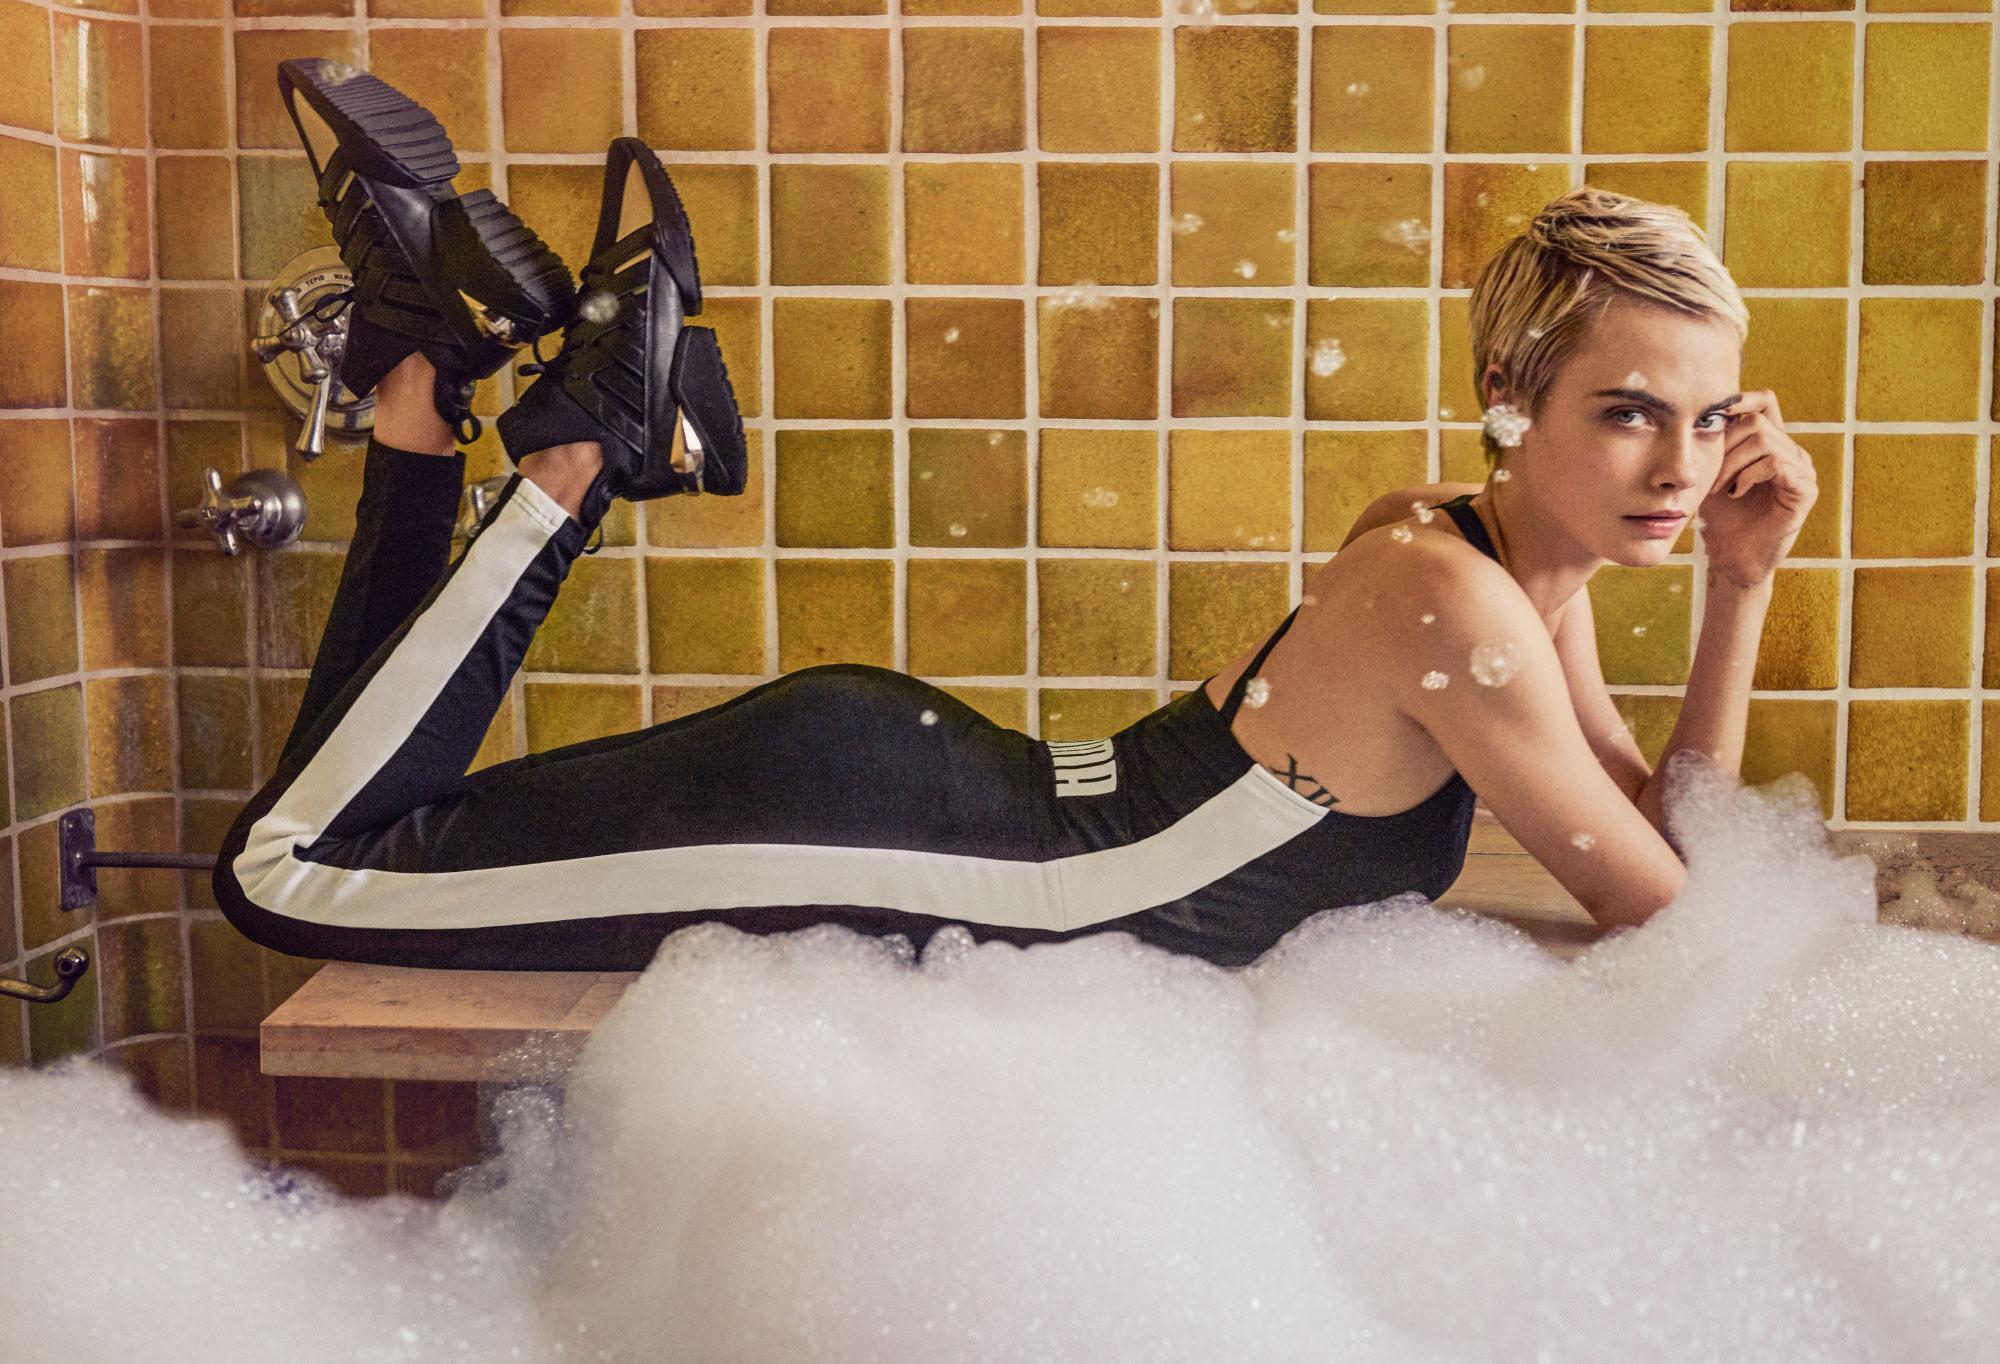 Natalia andreeva sexy 7 Photos,Josefin asplund forced sex in vikings series Sex archive Billy Kidd,Dascha polanco